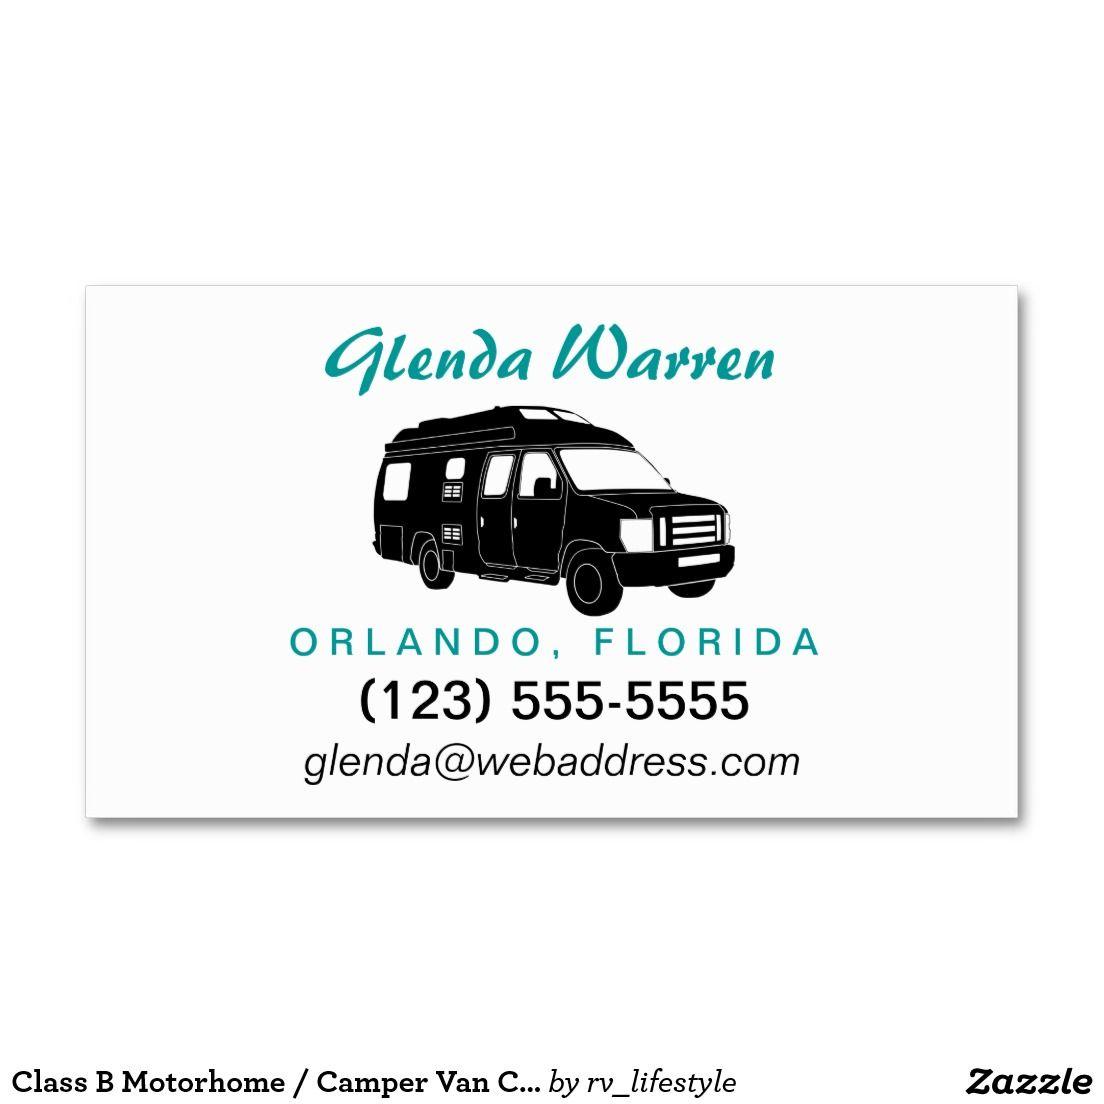 Class b motorhome camper van calling card business cards by rv class b motorhome camper van calling card business cards by rv lifestyle colourmoves